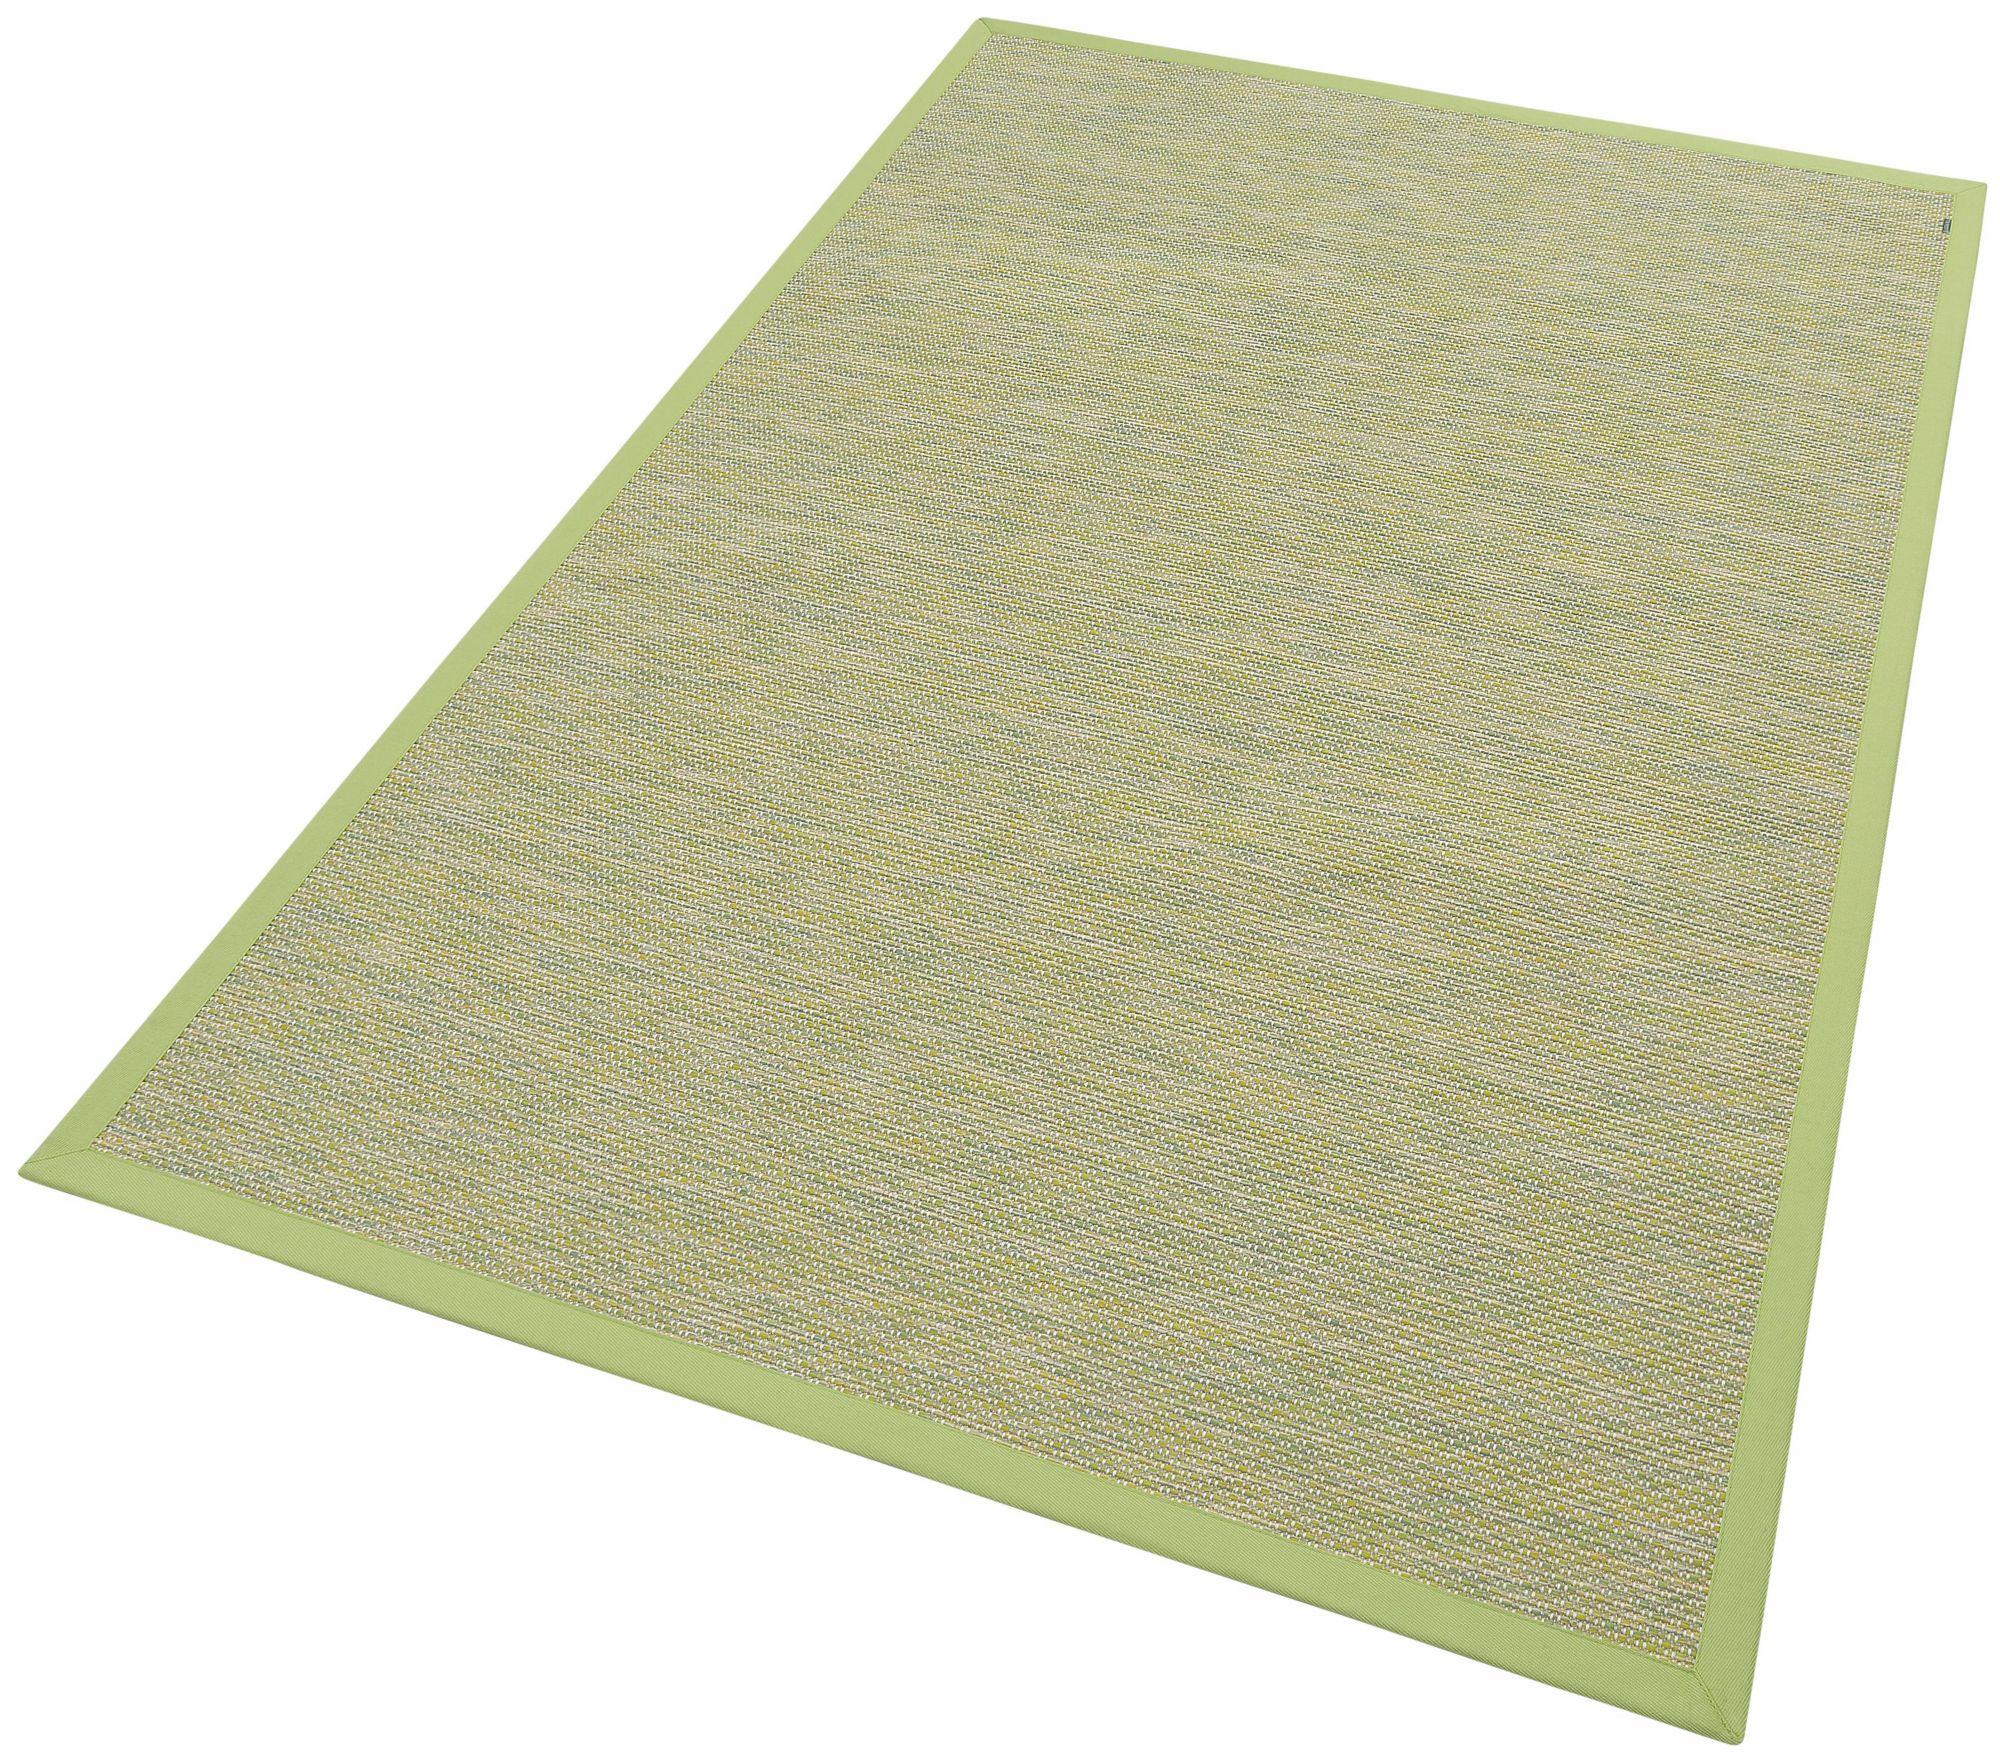 DEKOWE Teppich, Dekowe, »Color«, Melange-Effekt, Sisaloptik, Wunschmaß